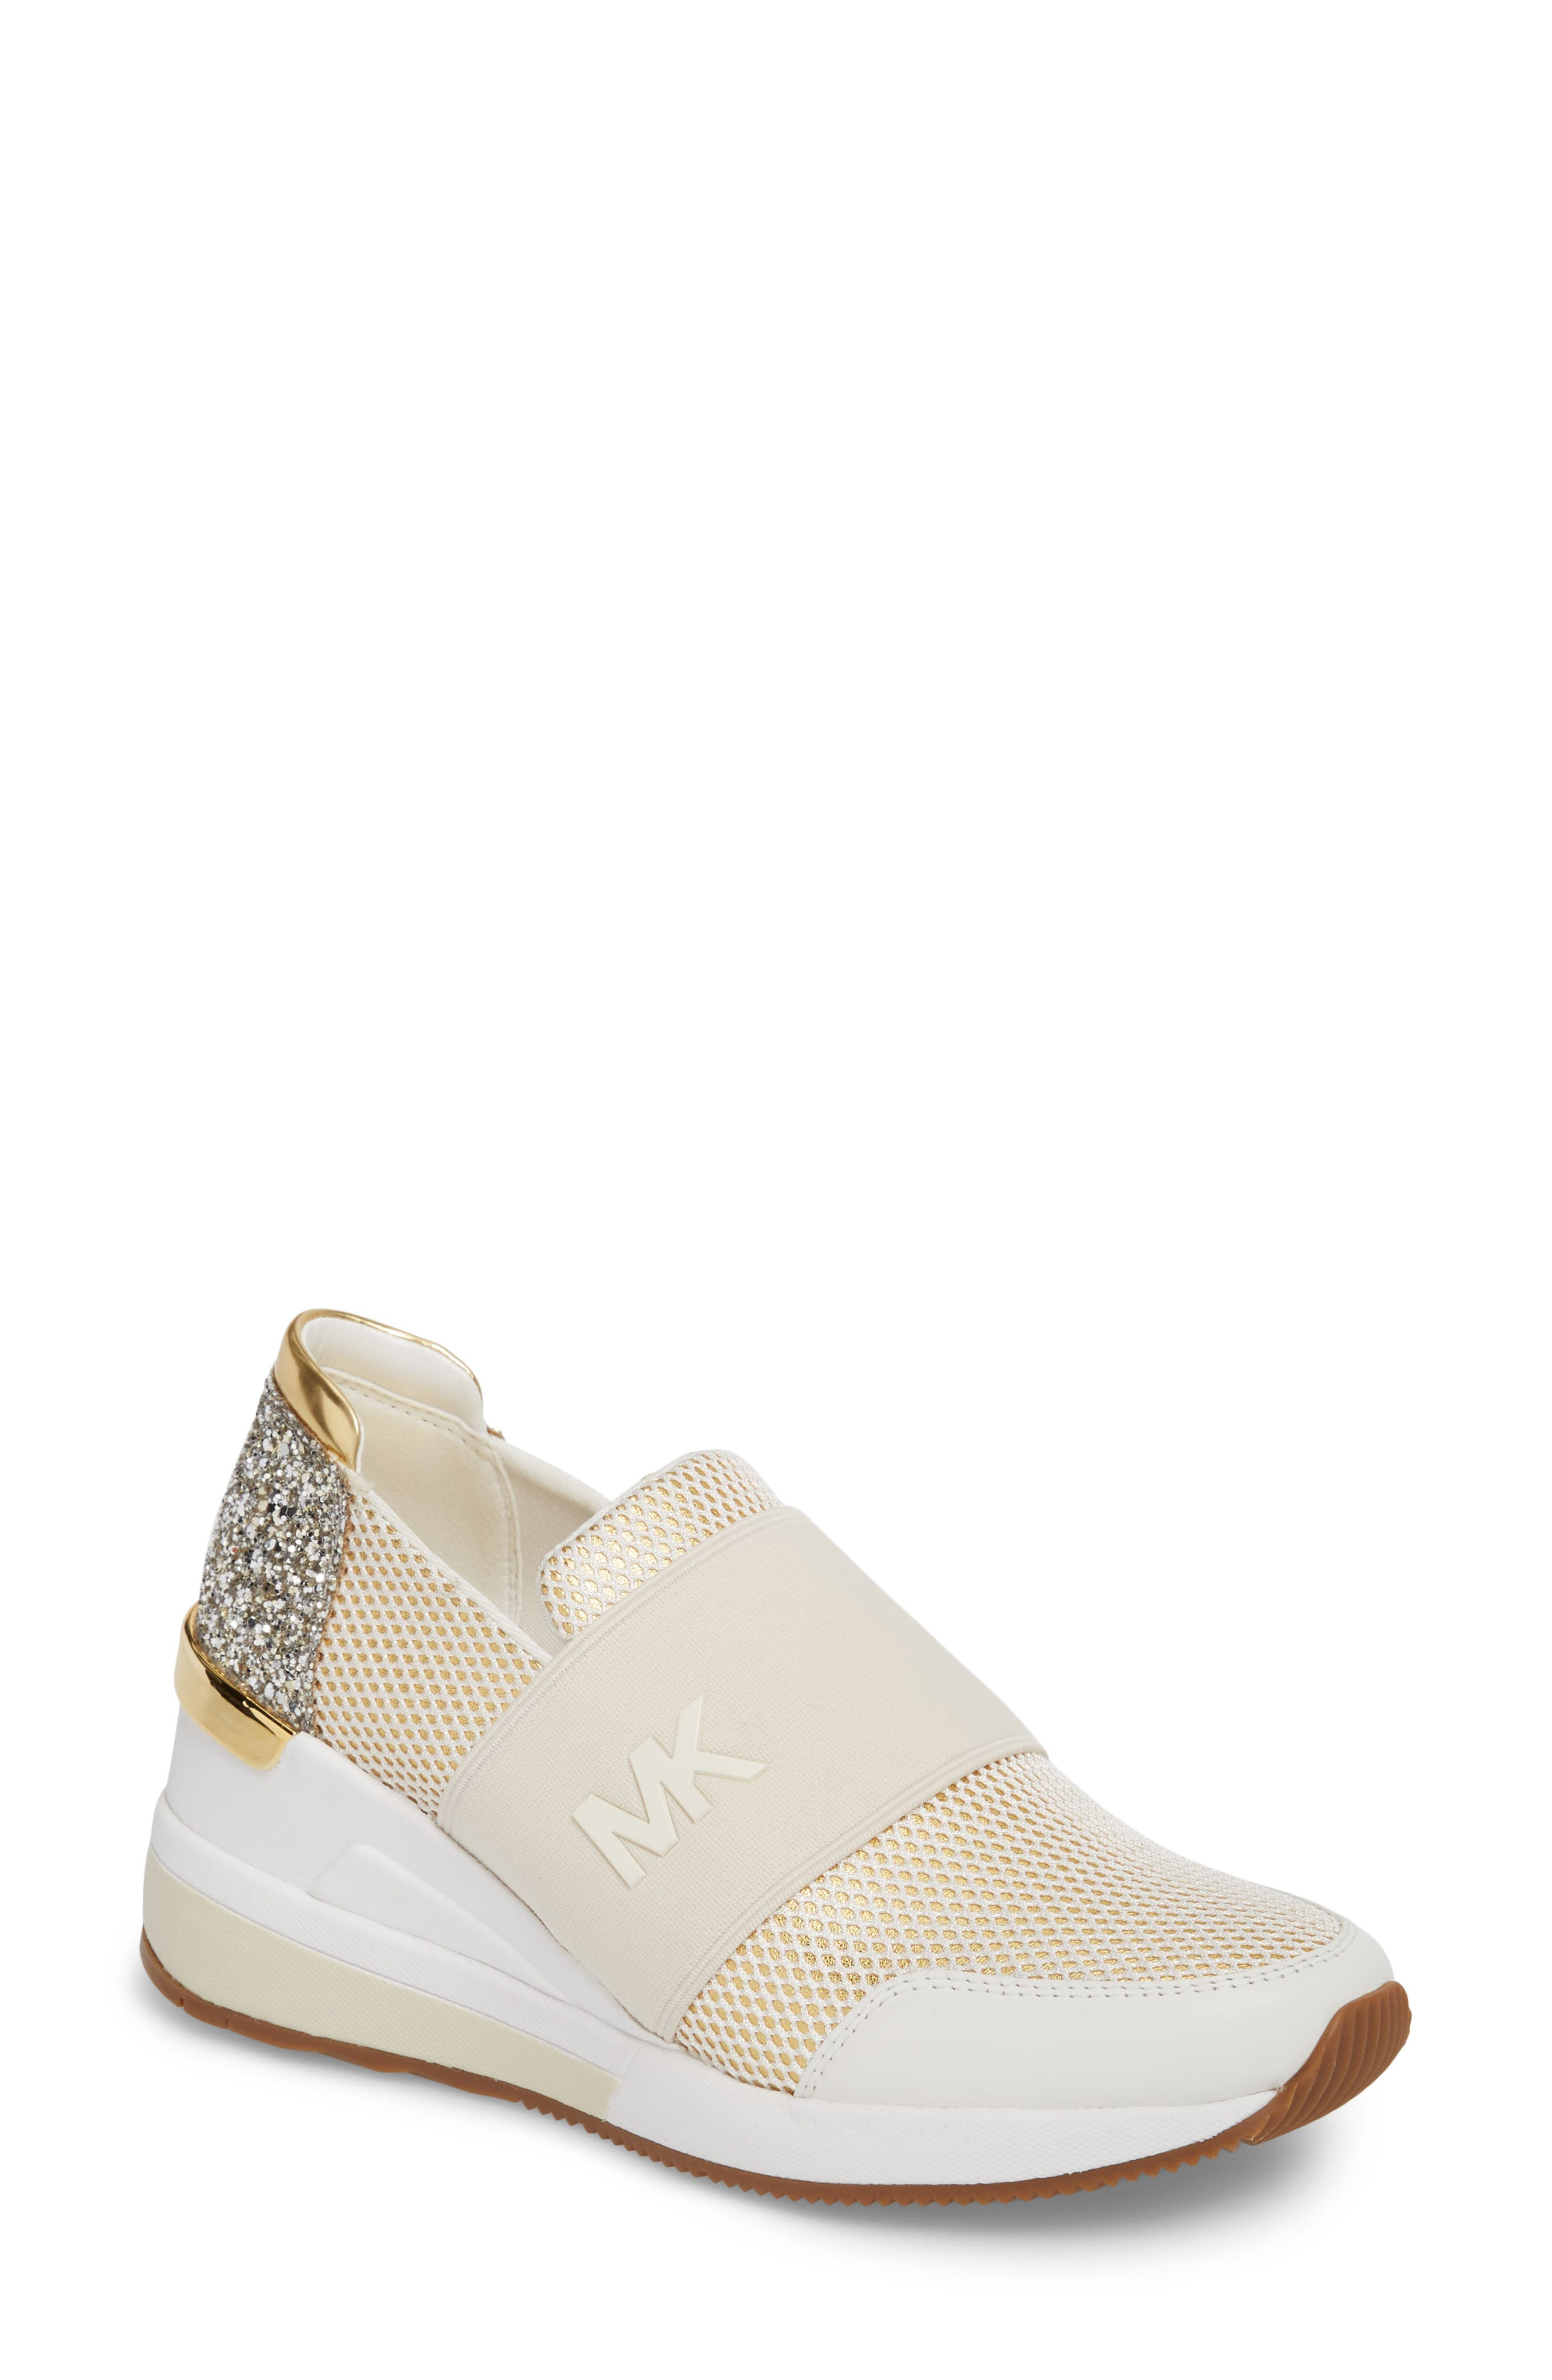 1zx14wXCvn Sneakers Femme SOFT PINK, 37